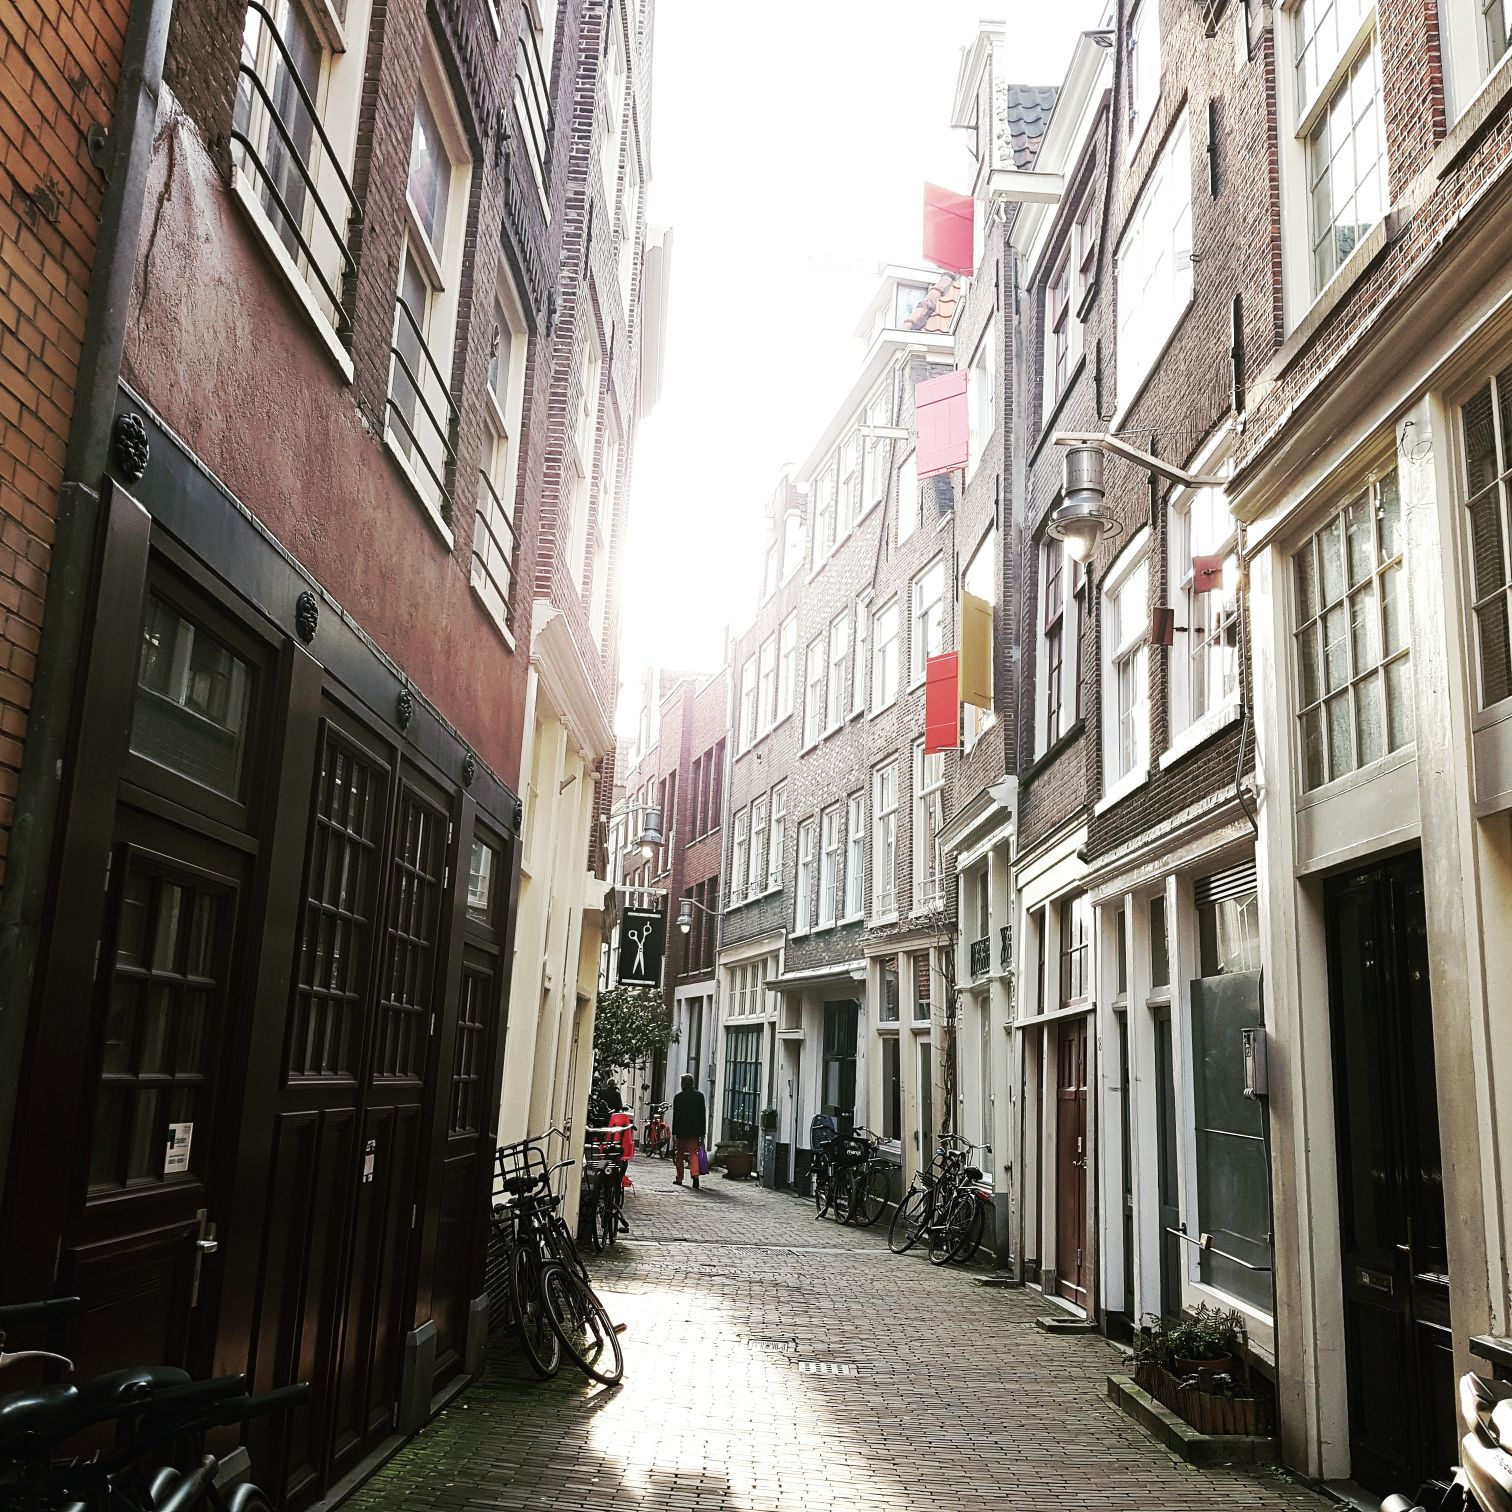 Alleys in Amsterdam